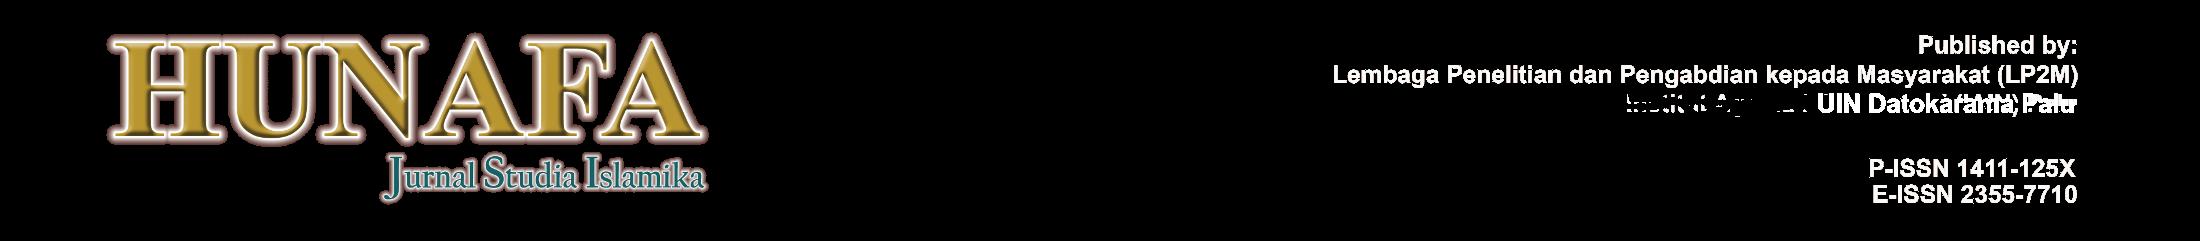 Page Header Logo